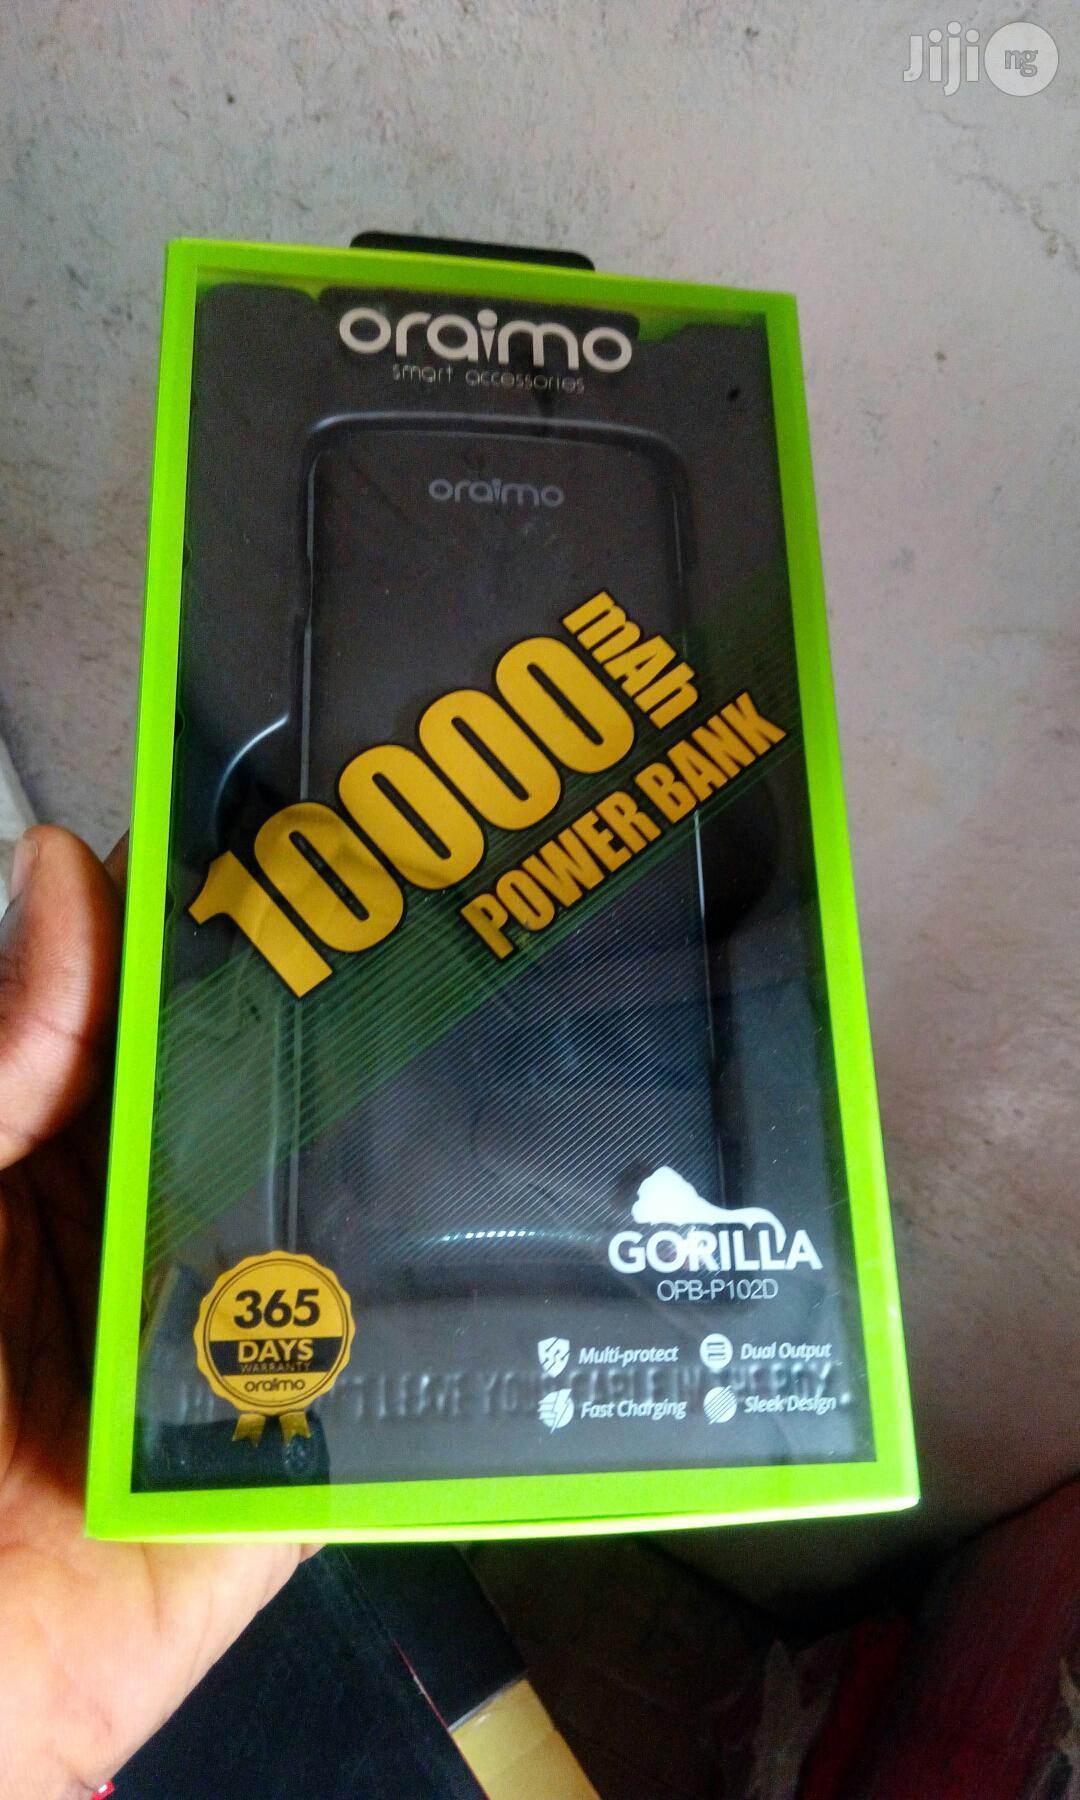 Oraimo Power Bank 10000mah